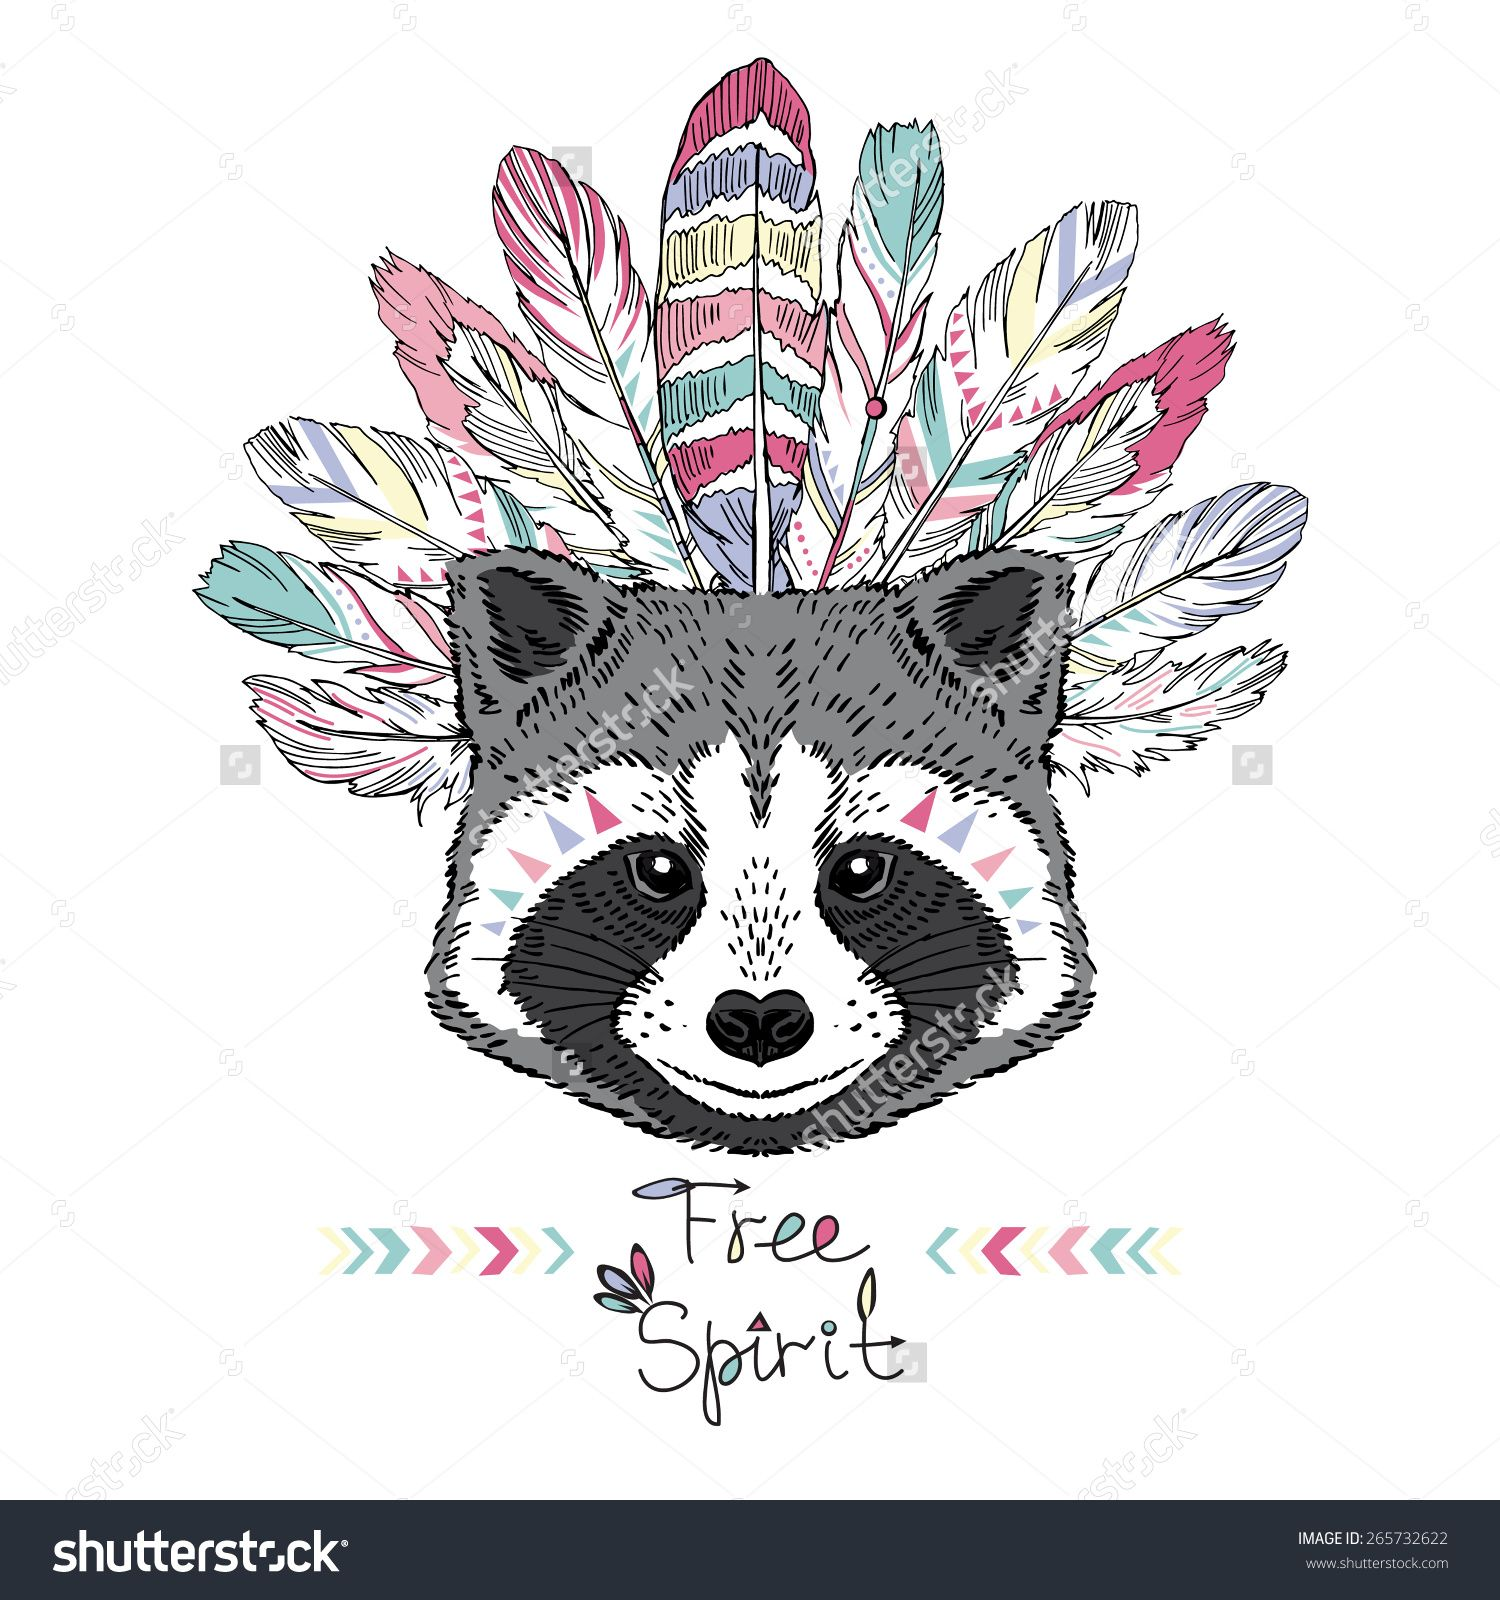 Raccoon Aztec Style Hand Drawn Animal Illustration Native American Poster T Shirt